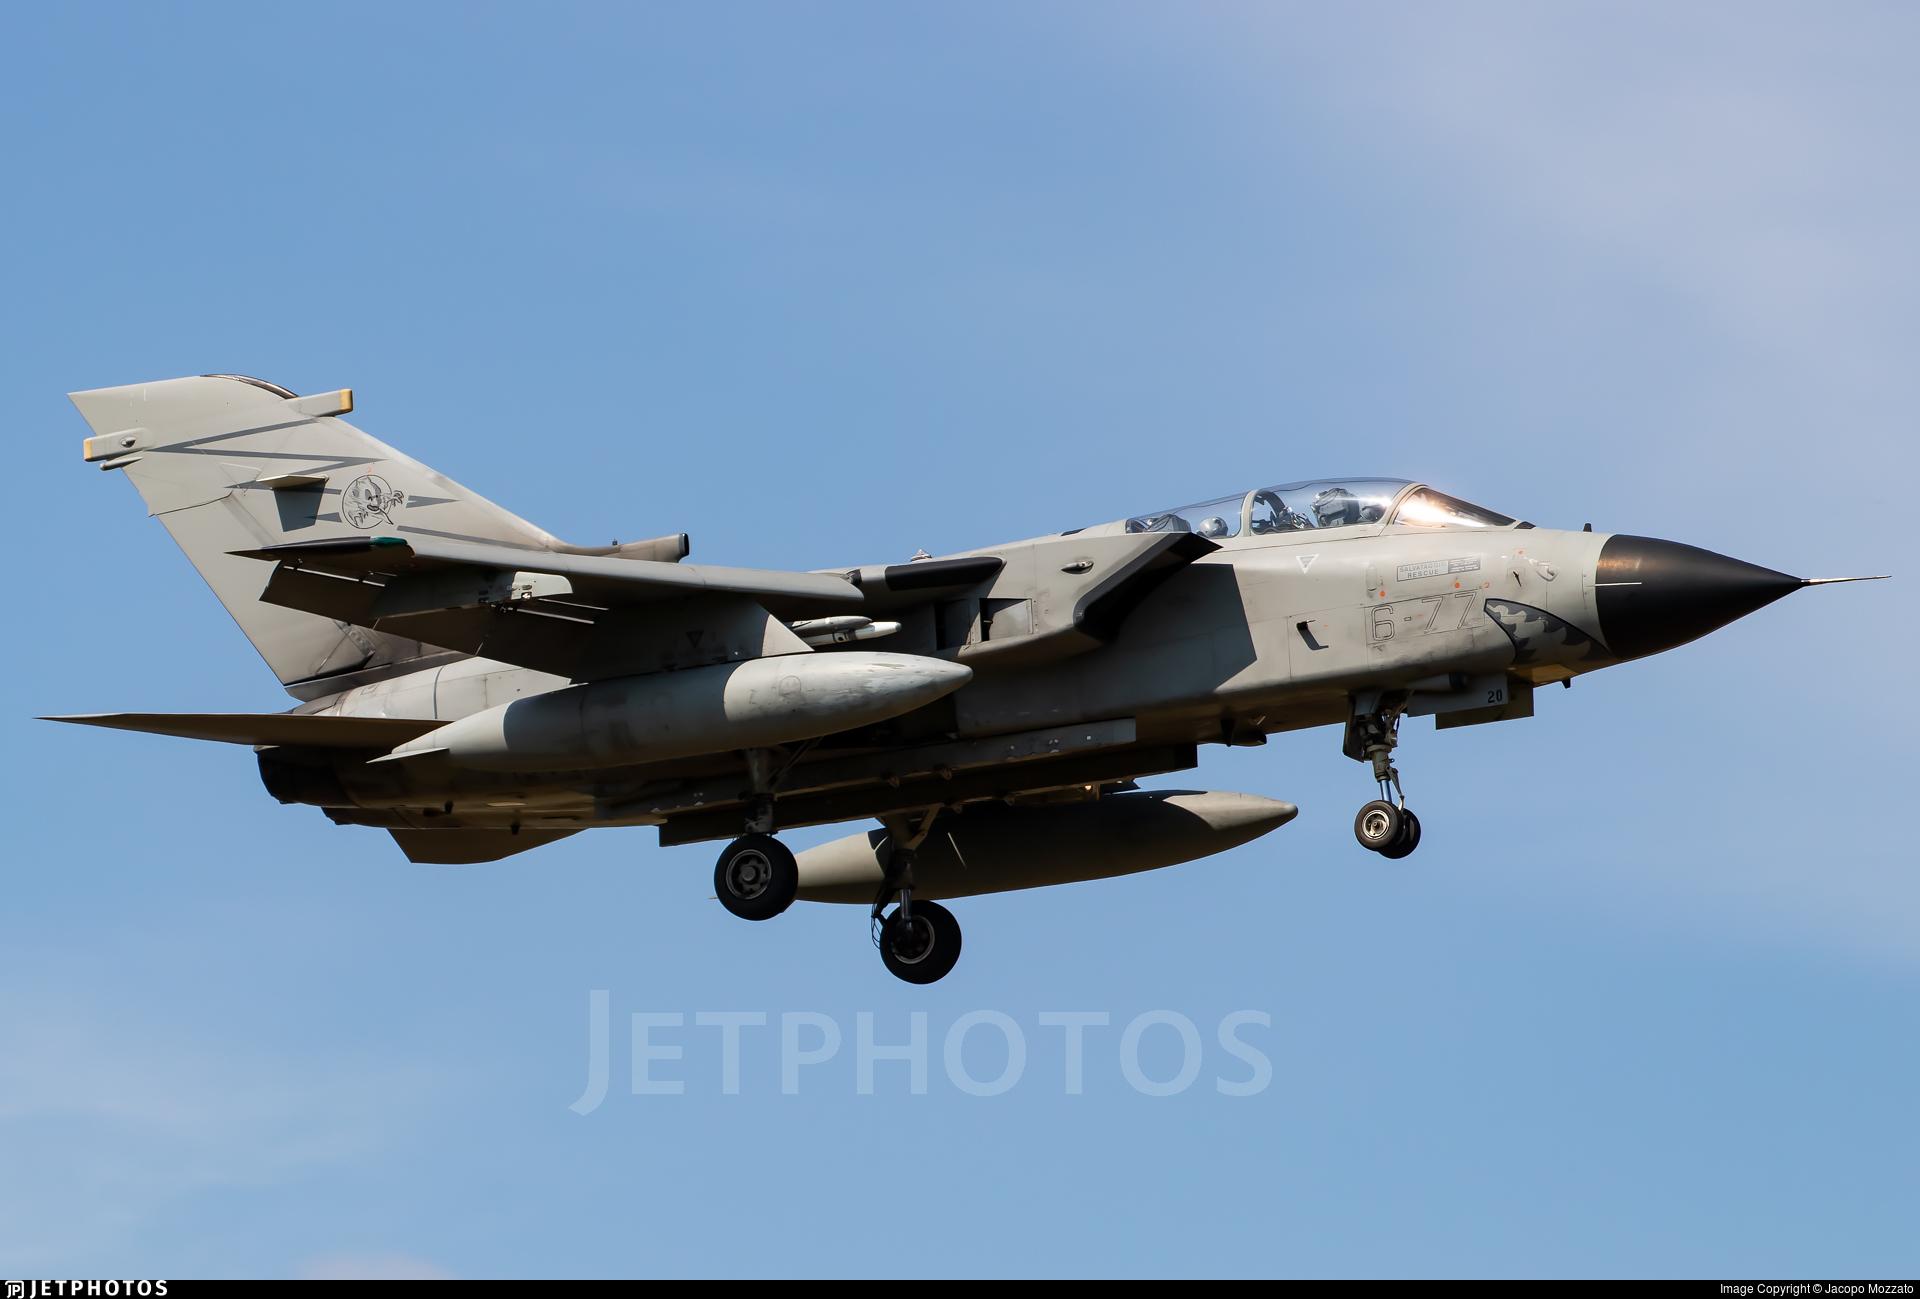 MM7020 - Panavia Tornado ECR - Italy - Air Force